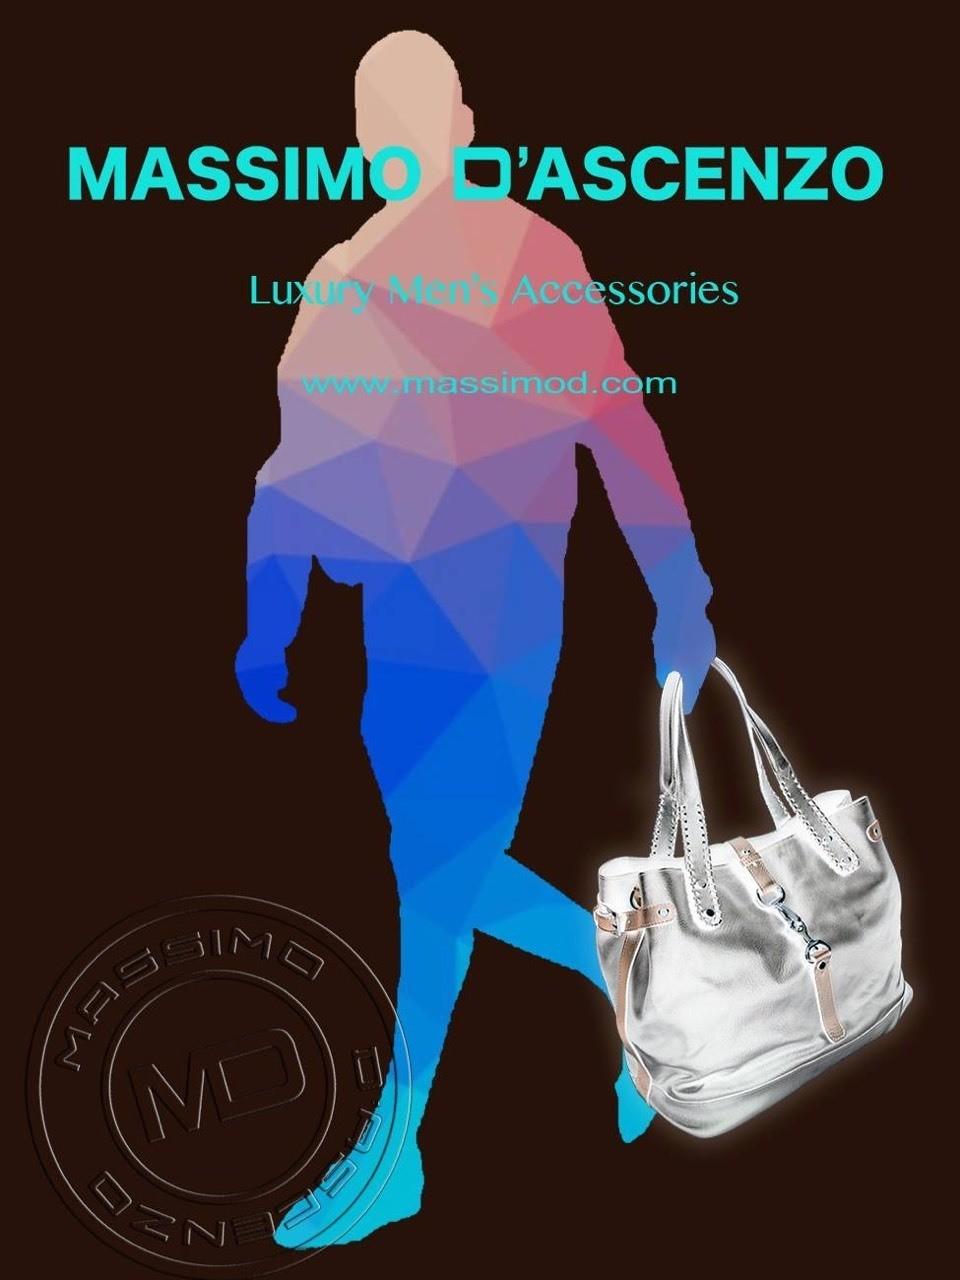 "'MD' Massimo D'ascenzo's Luxury Men's Accessories. ""Brooklyn Collection"". Quality Craftsmanship. Details...www.massimod.com #luxury#jewellery#handbags#love#fashionAddict#luxuryDesigns."